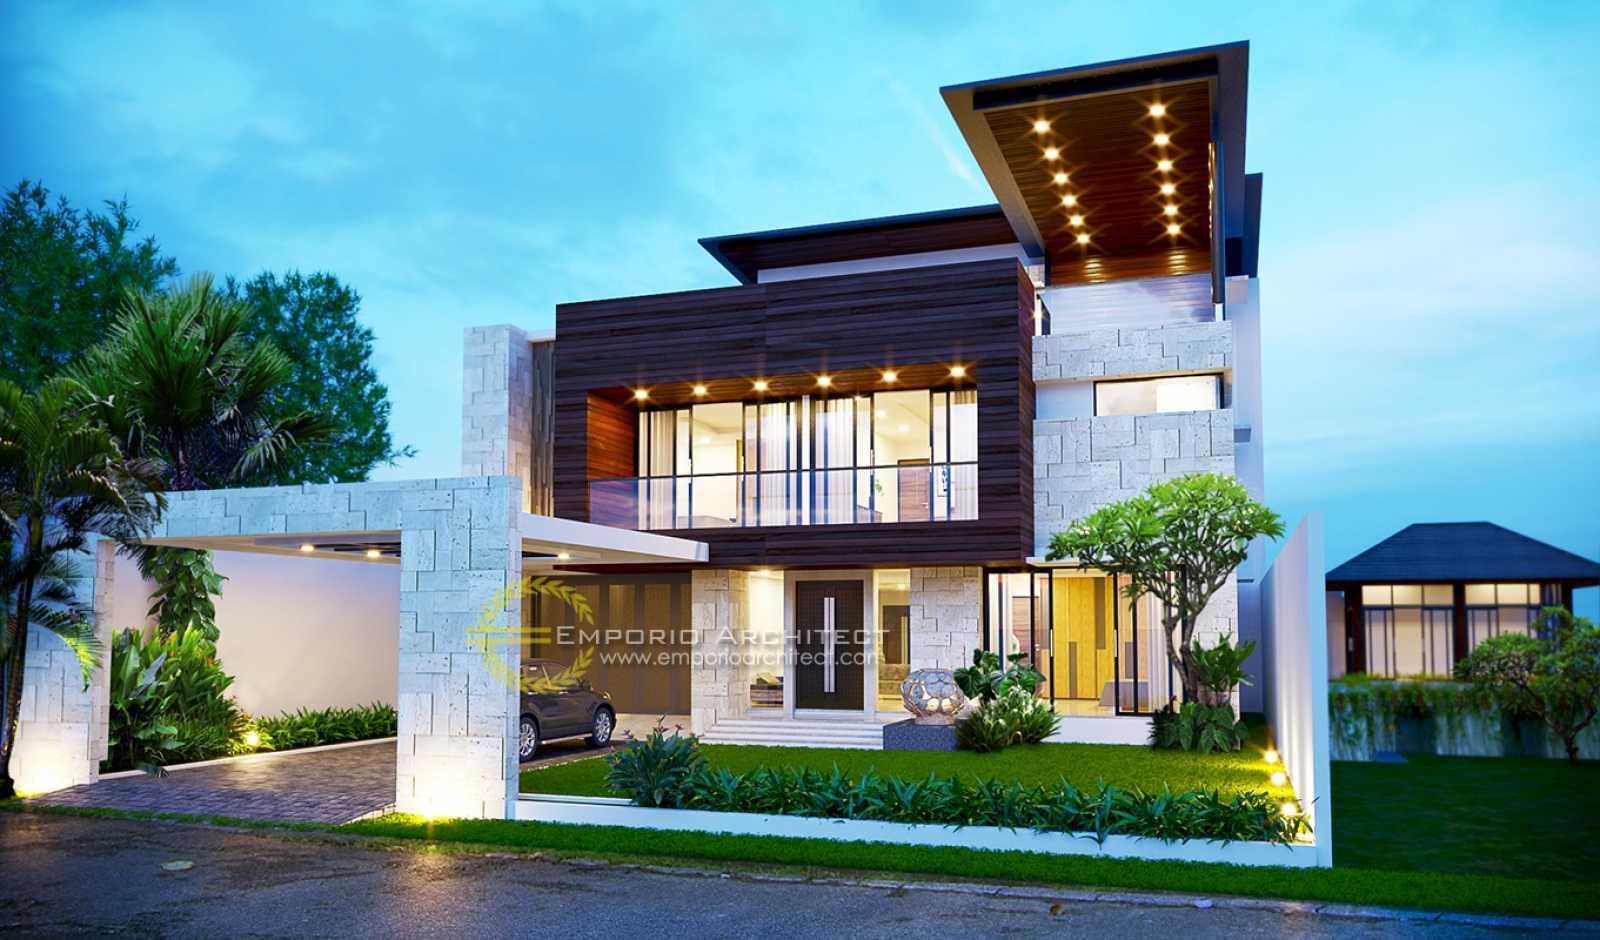 Emporio Architect Jasa Arsitek Bekasi Desain Rumah Modern Tropis 246 @ Cikarang, Bekasi Cikarang, Bekasi, Jawa Barat, Indonesia Cikarang, Bekasi, Jawa Barat, Indonesia Emporio-Architect-Jasa-Arsitek-Bekasi-Desain-Rumah-Modern-Tropis-246-Cikarang-Bekasi Modern  79243